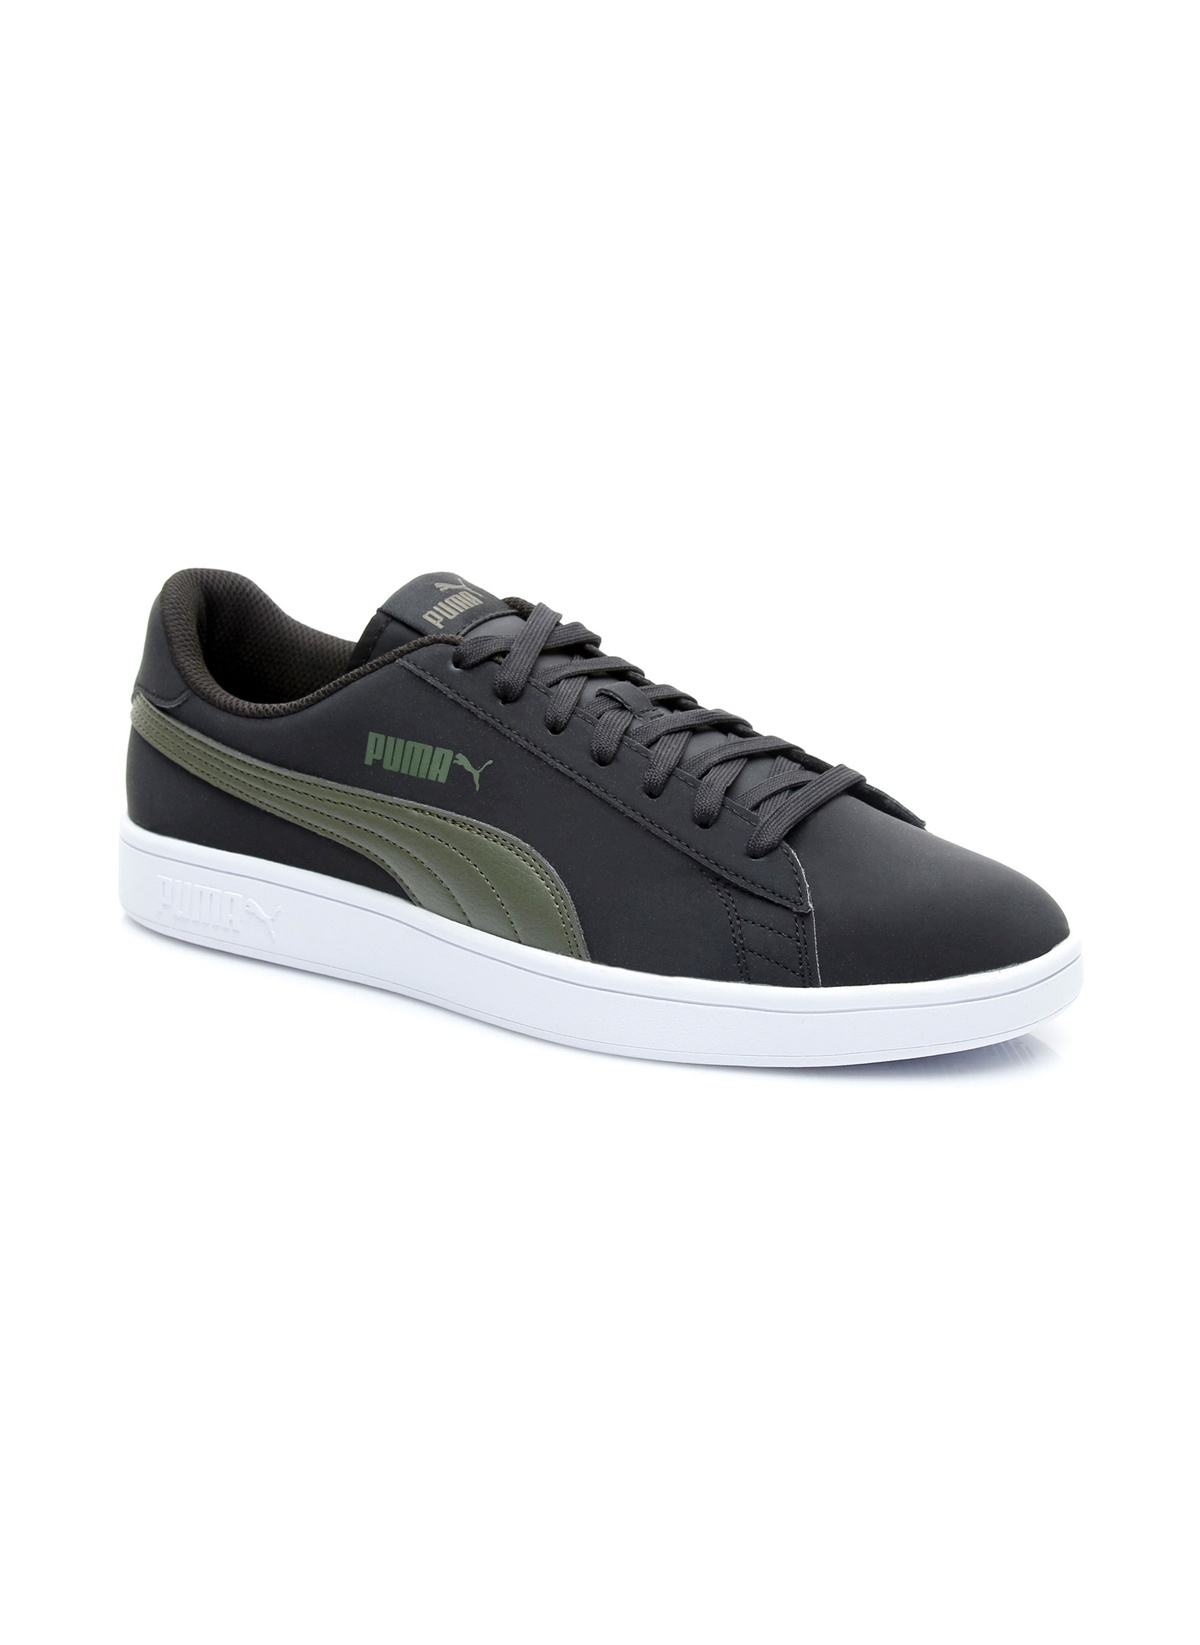 Puma Sneakers 36516005 Puma Lifestyle Ayakkabı – 279.9 TL